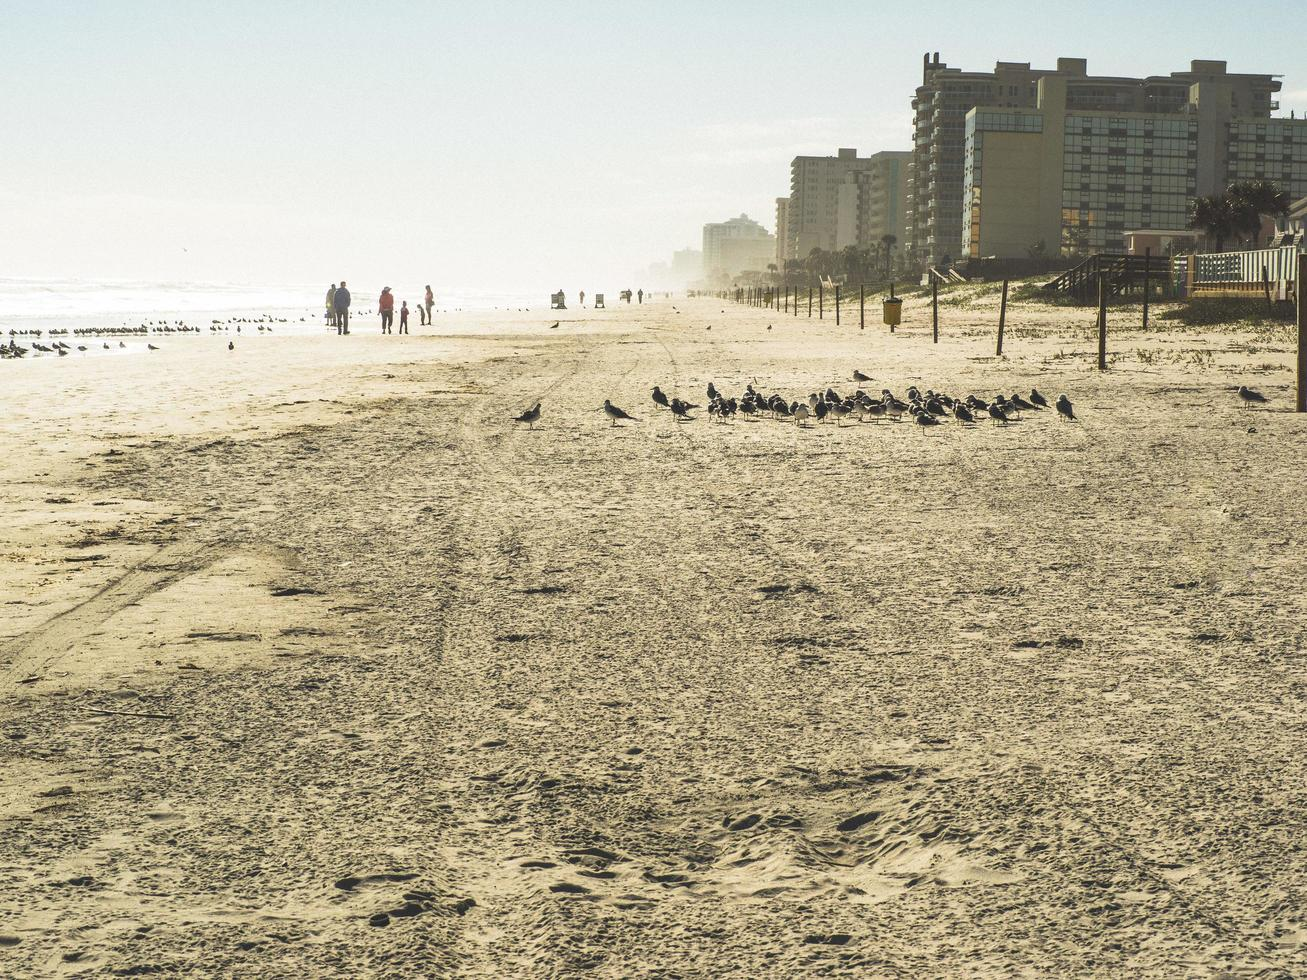 Daytona Beach, Florida, Winter, 2016 - A morning on the beach photo